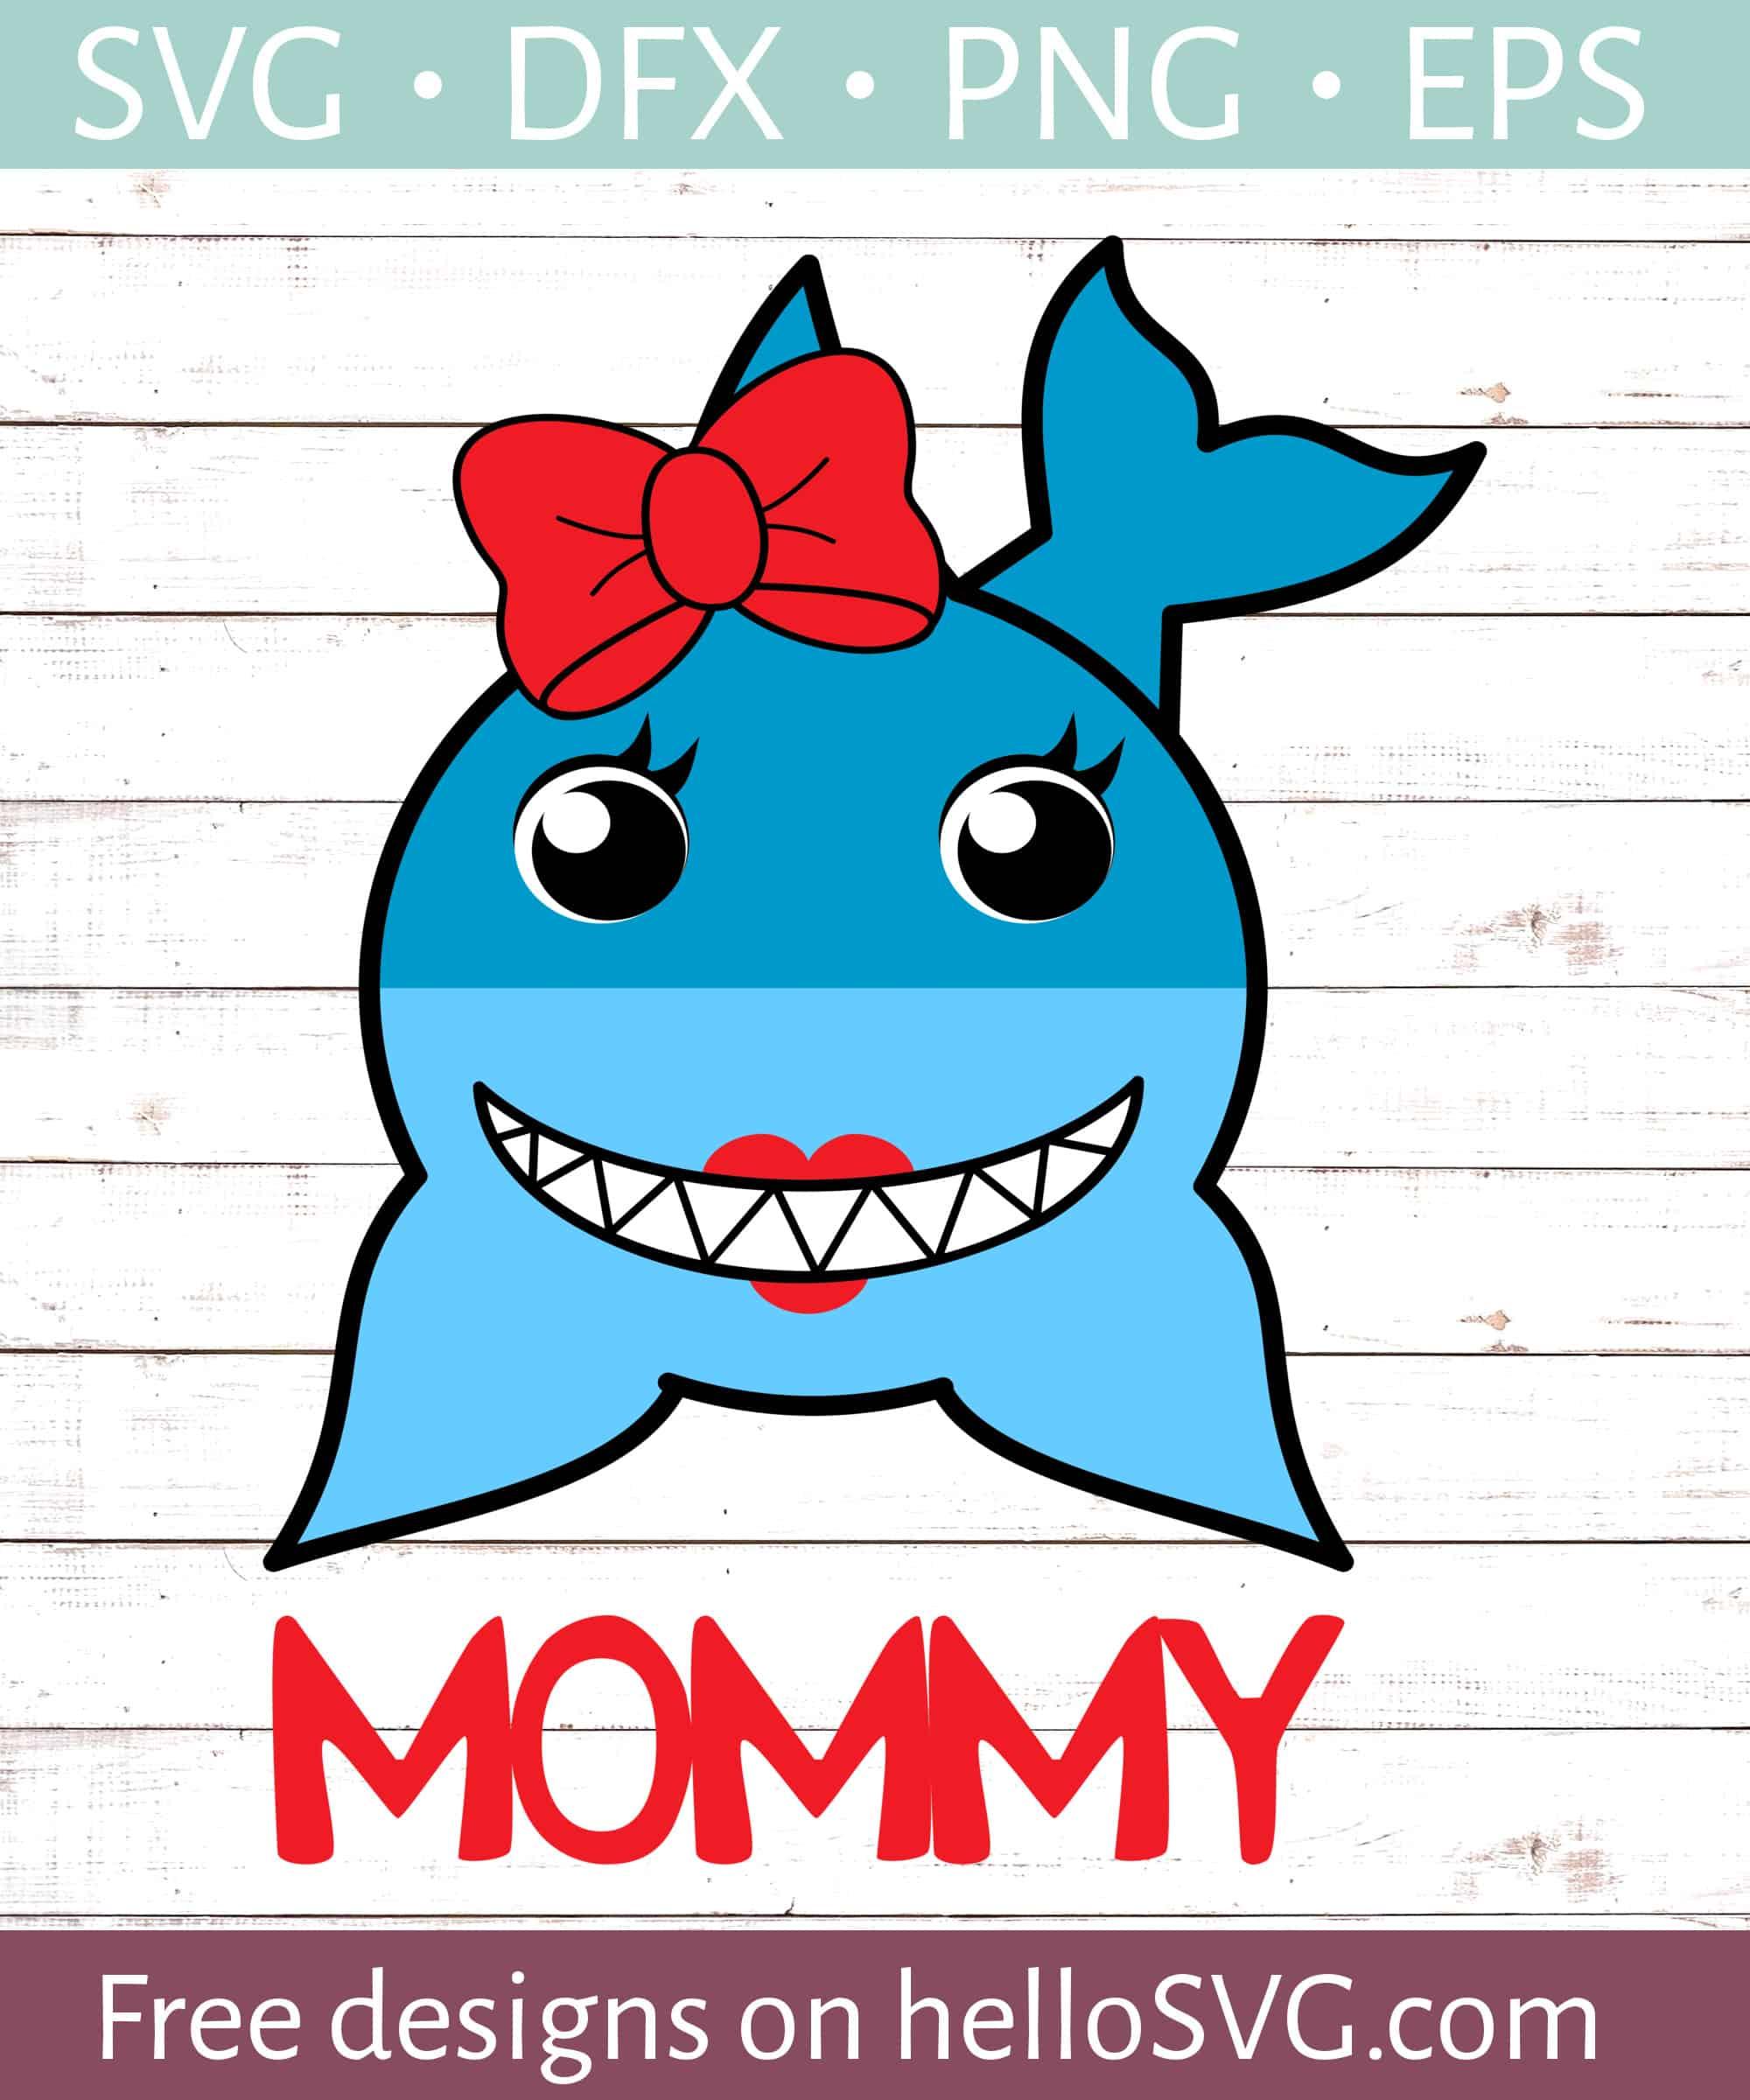 Mommy Shark Svg Free : mommy, shark, Mommy, Shark, Files, HelloSVG.com